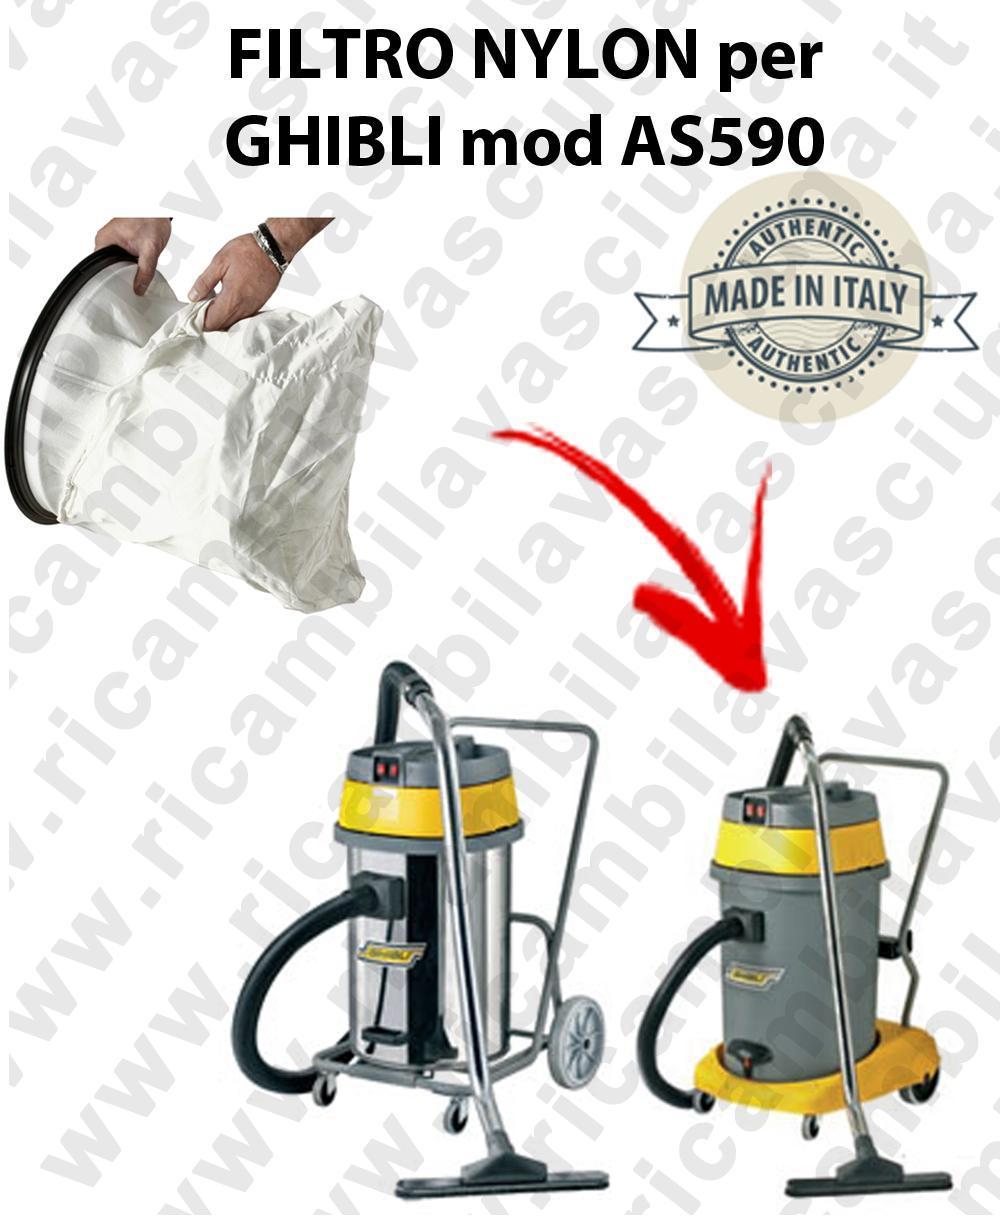 SACCO Filtro de Nylon cod: 3001220 para aspiradora GHIBLI Model AS590